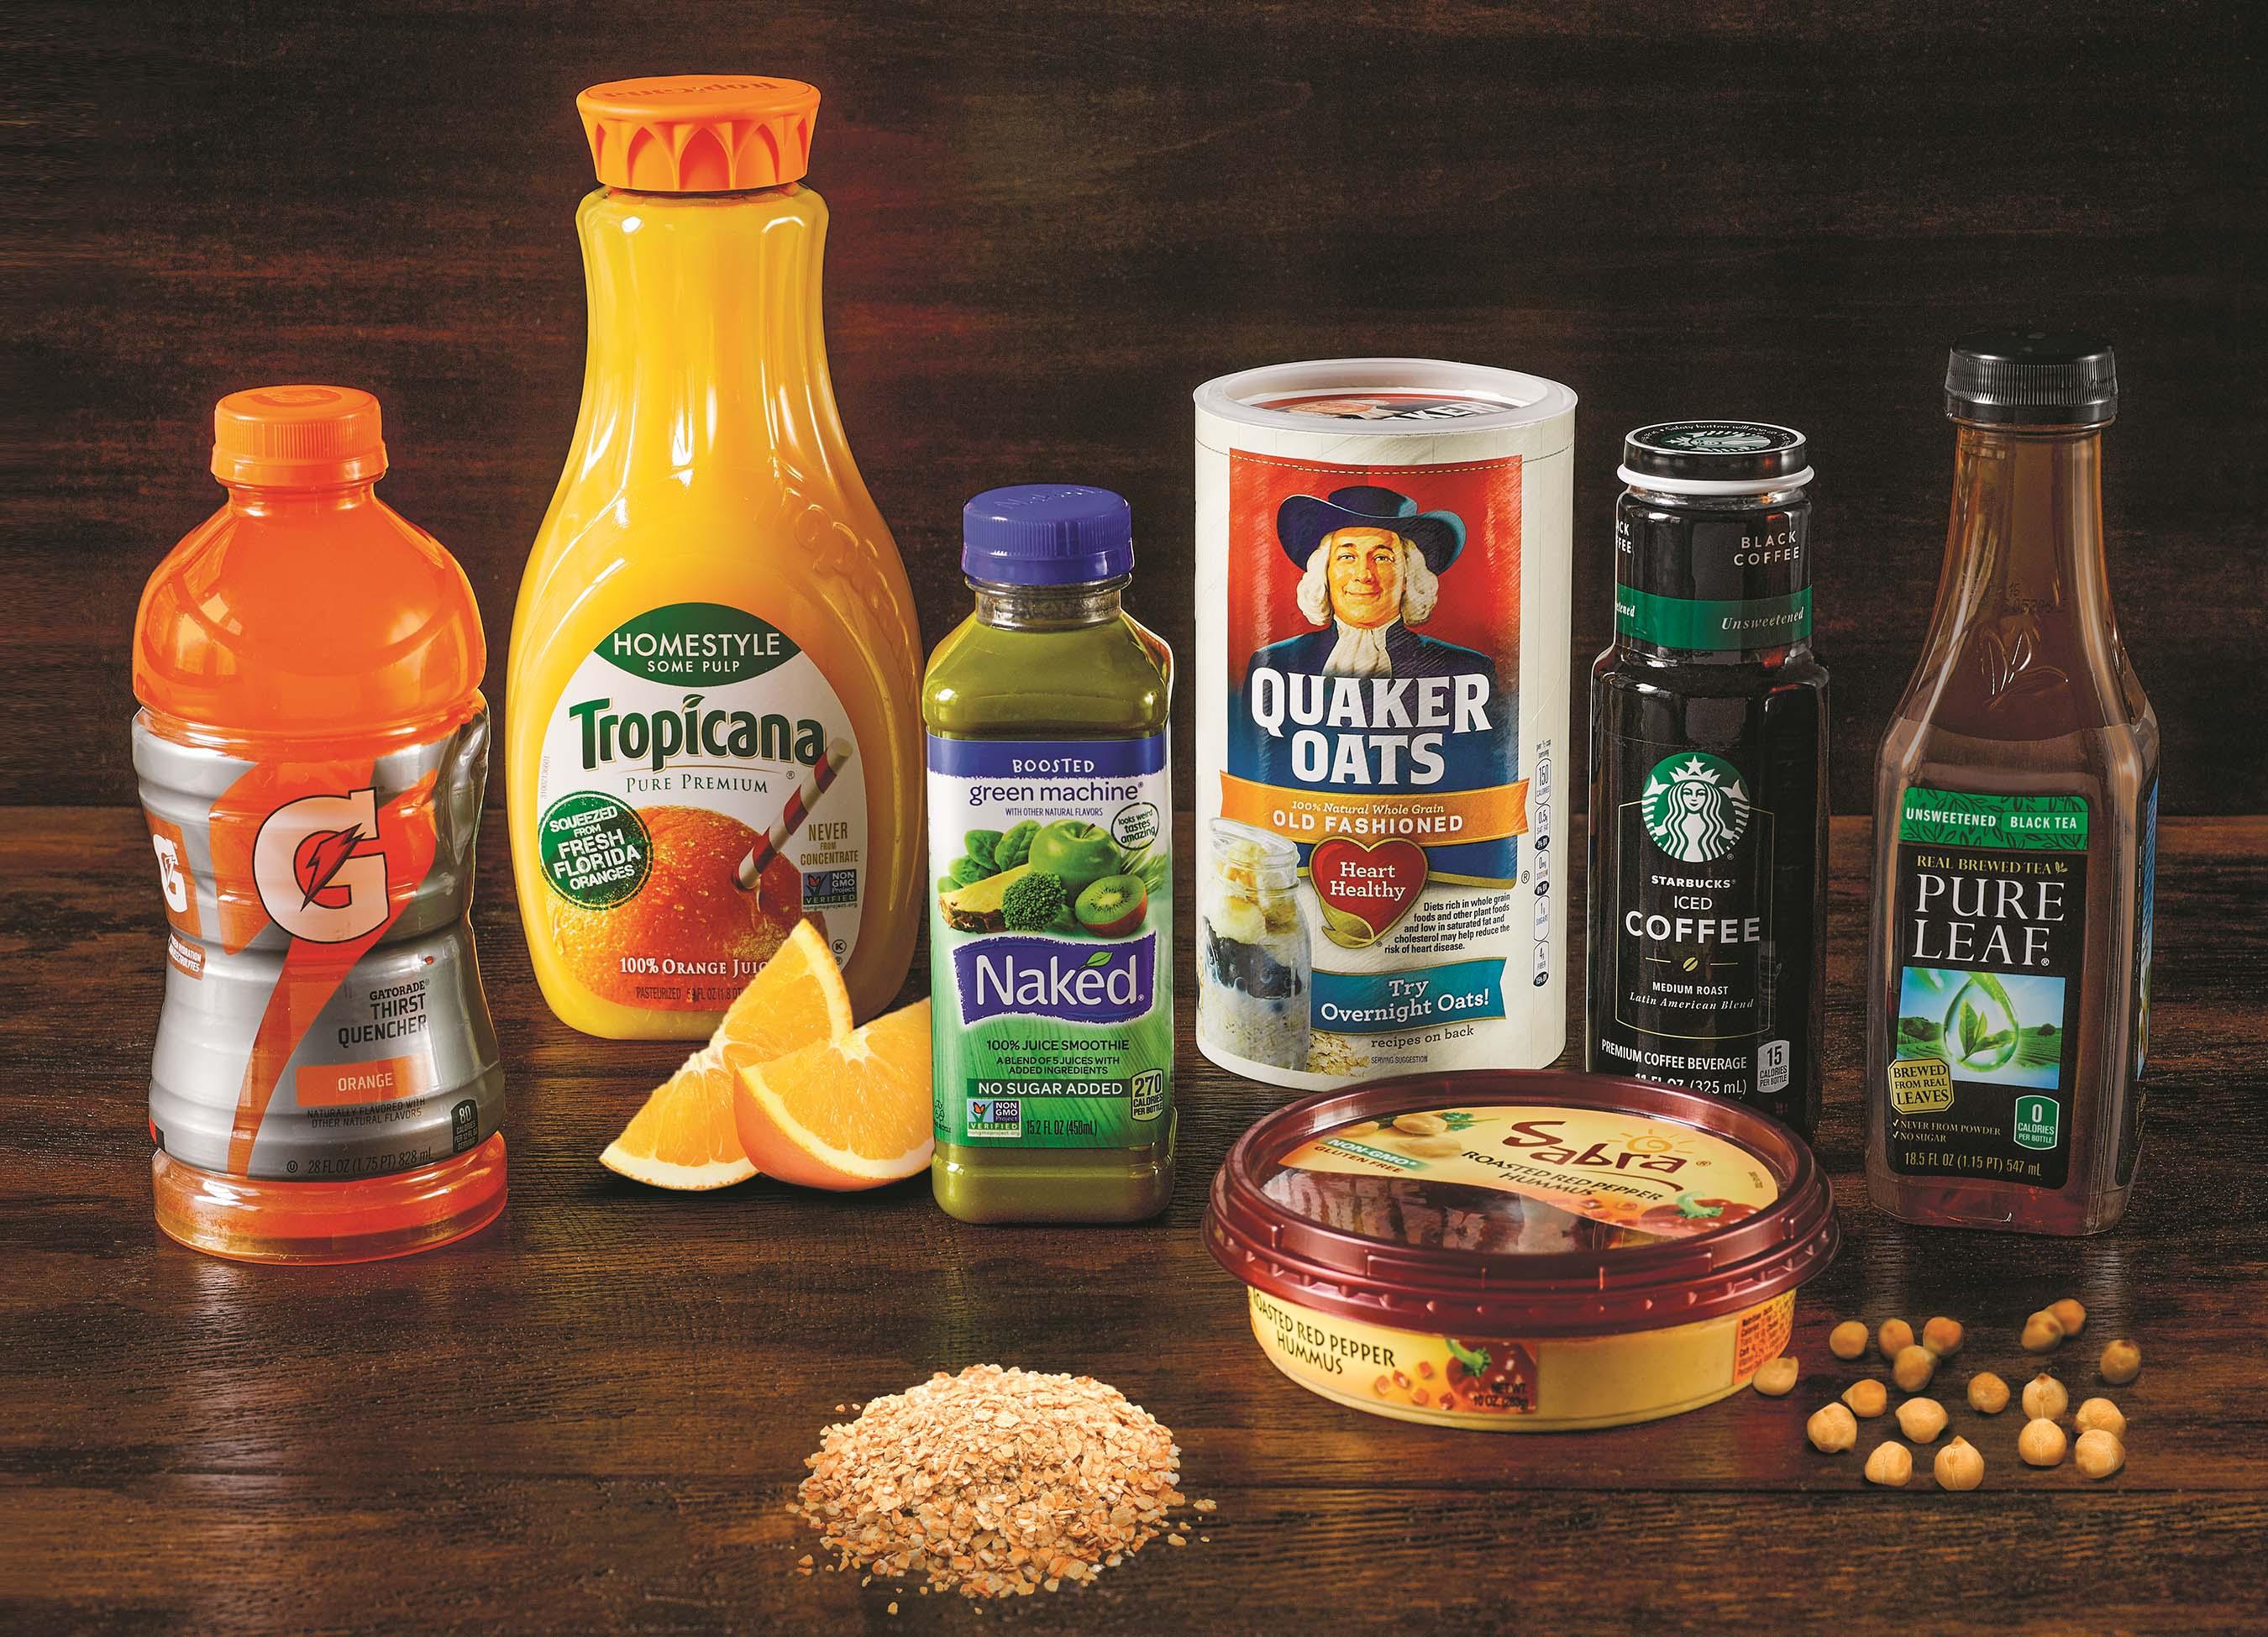 Gatorade, Tropicana, Naked Juice, Quaker Oats, Starbucks cold coffee, Pure Leaf tea, and Sabra hummus on a table.